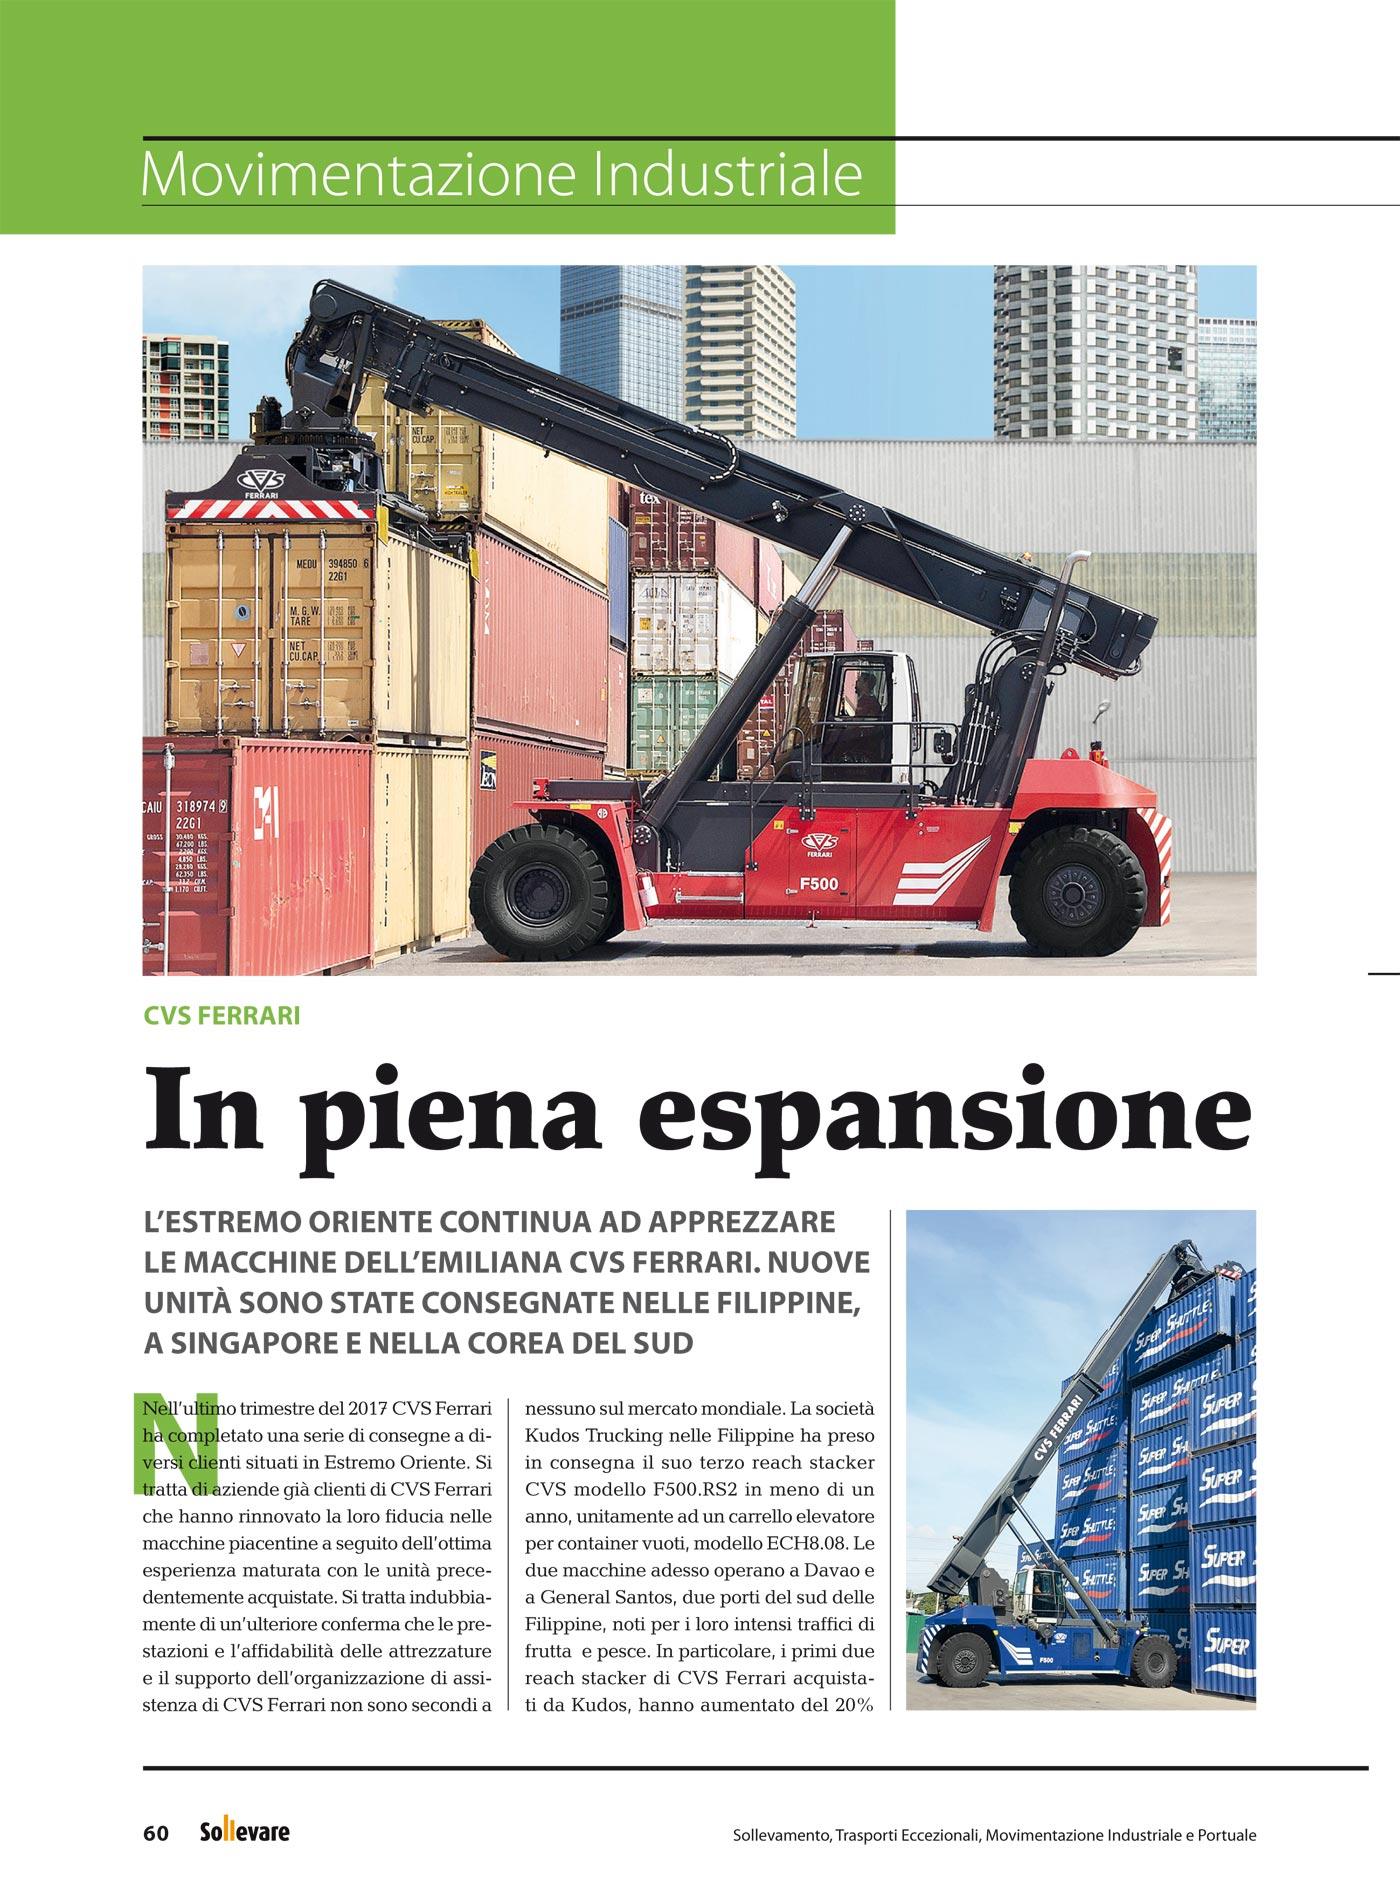 In the press - CVS ferrari sollevare april 2018